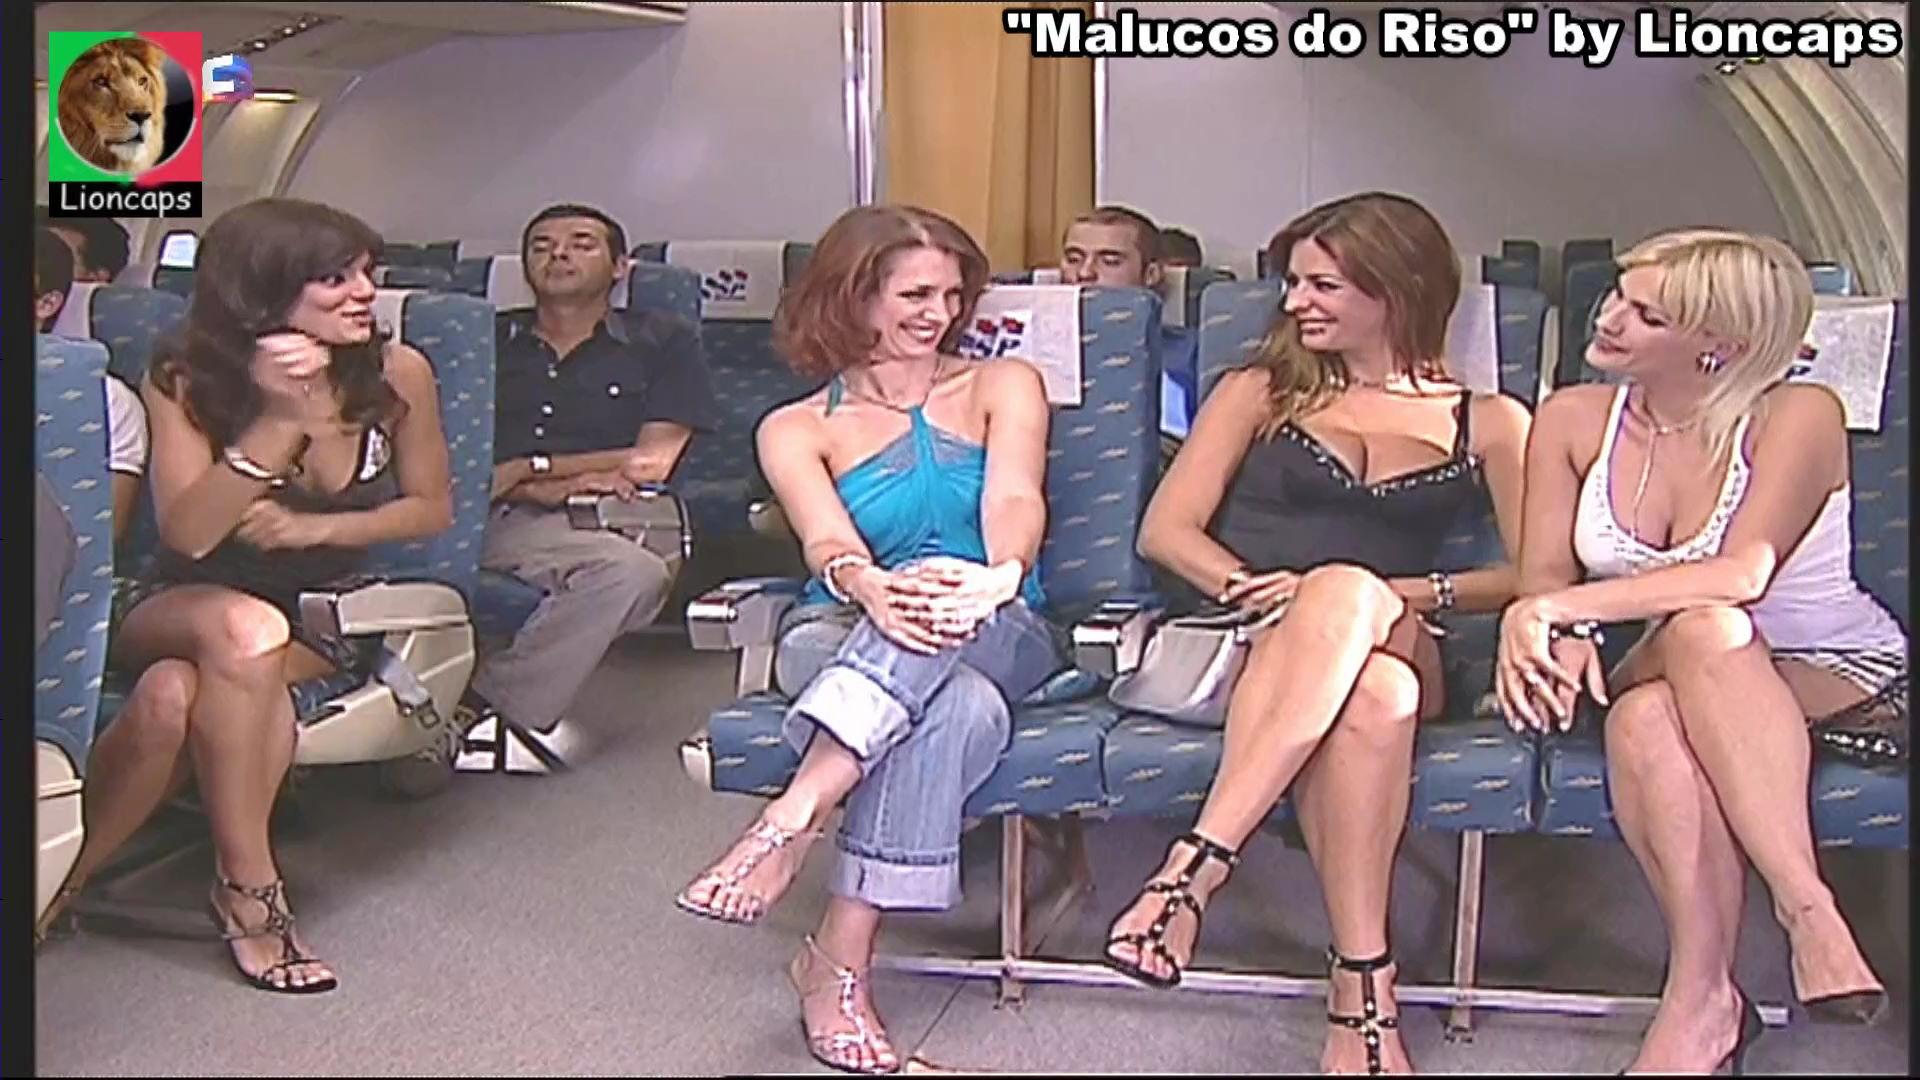 947508091_malucos_riso_alda_gomes_vs190malucos_riso_602_15019_122_242lo.JPG